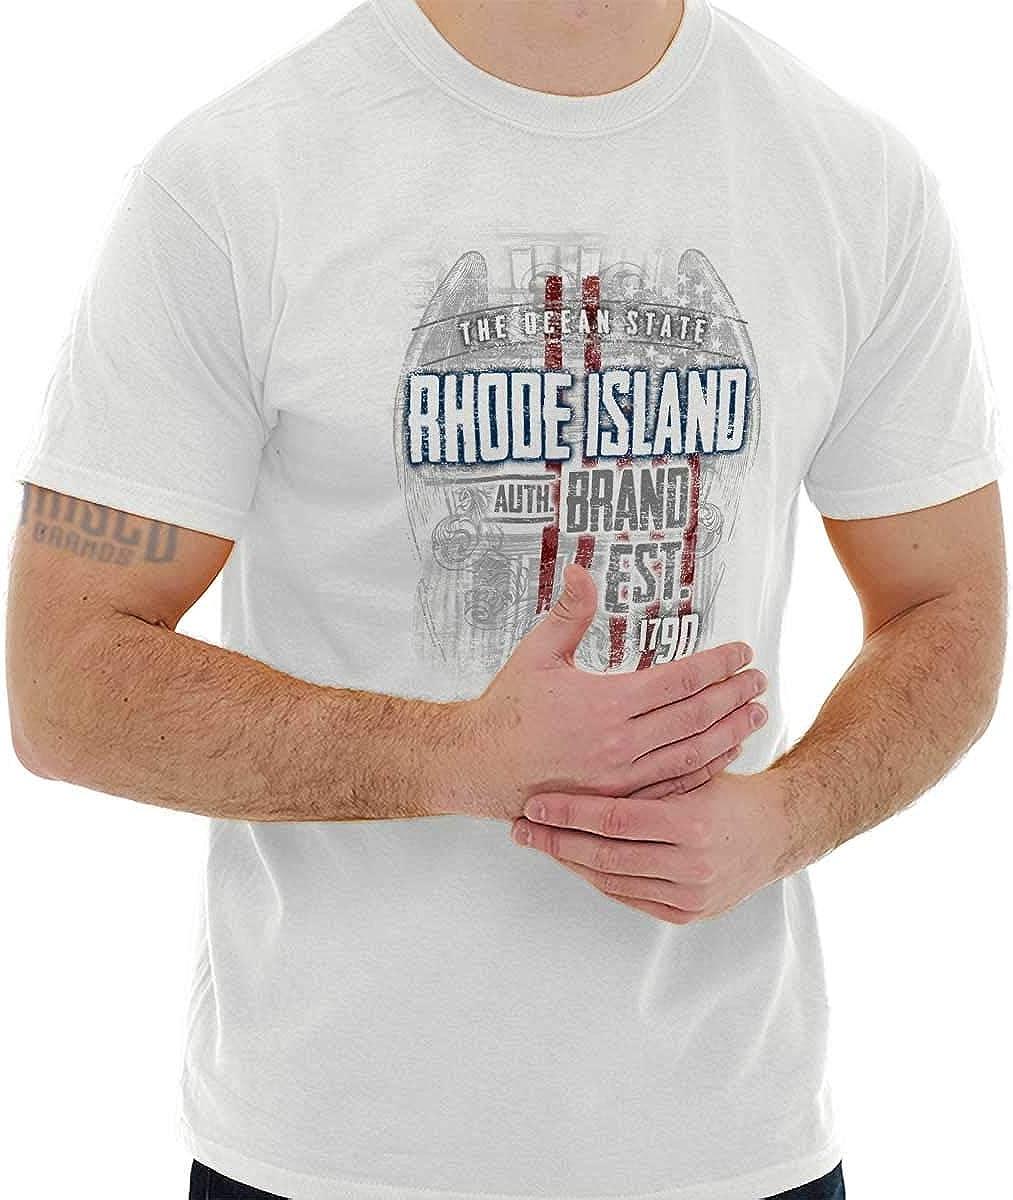 Classic teaze Rhode Island Estado Estados Unidos T Shirt Patriotic ...